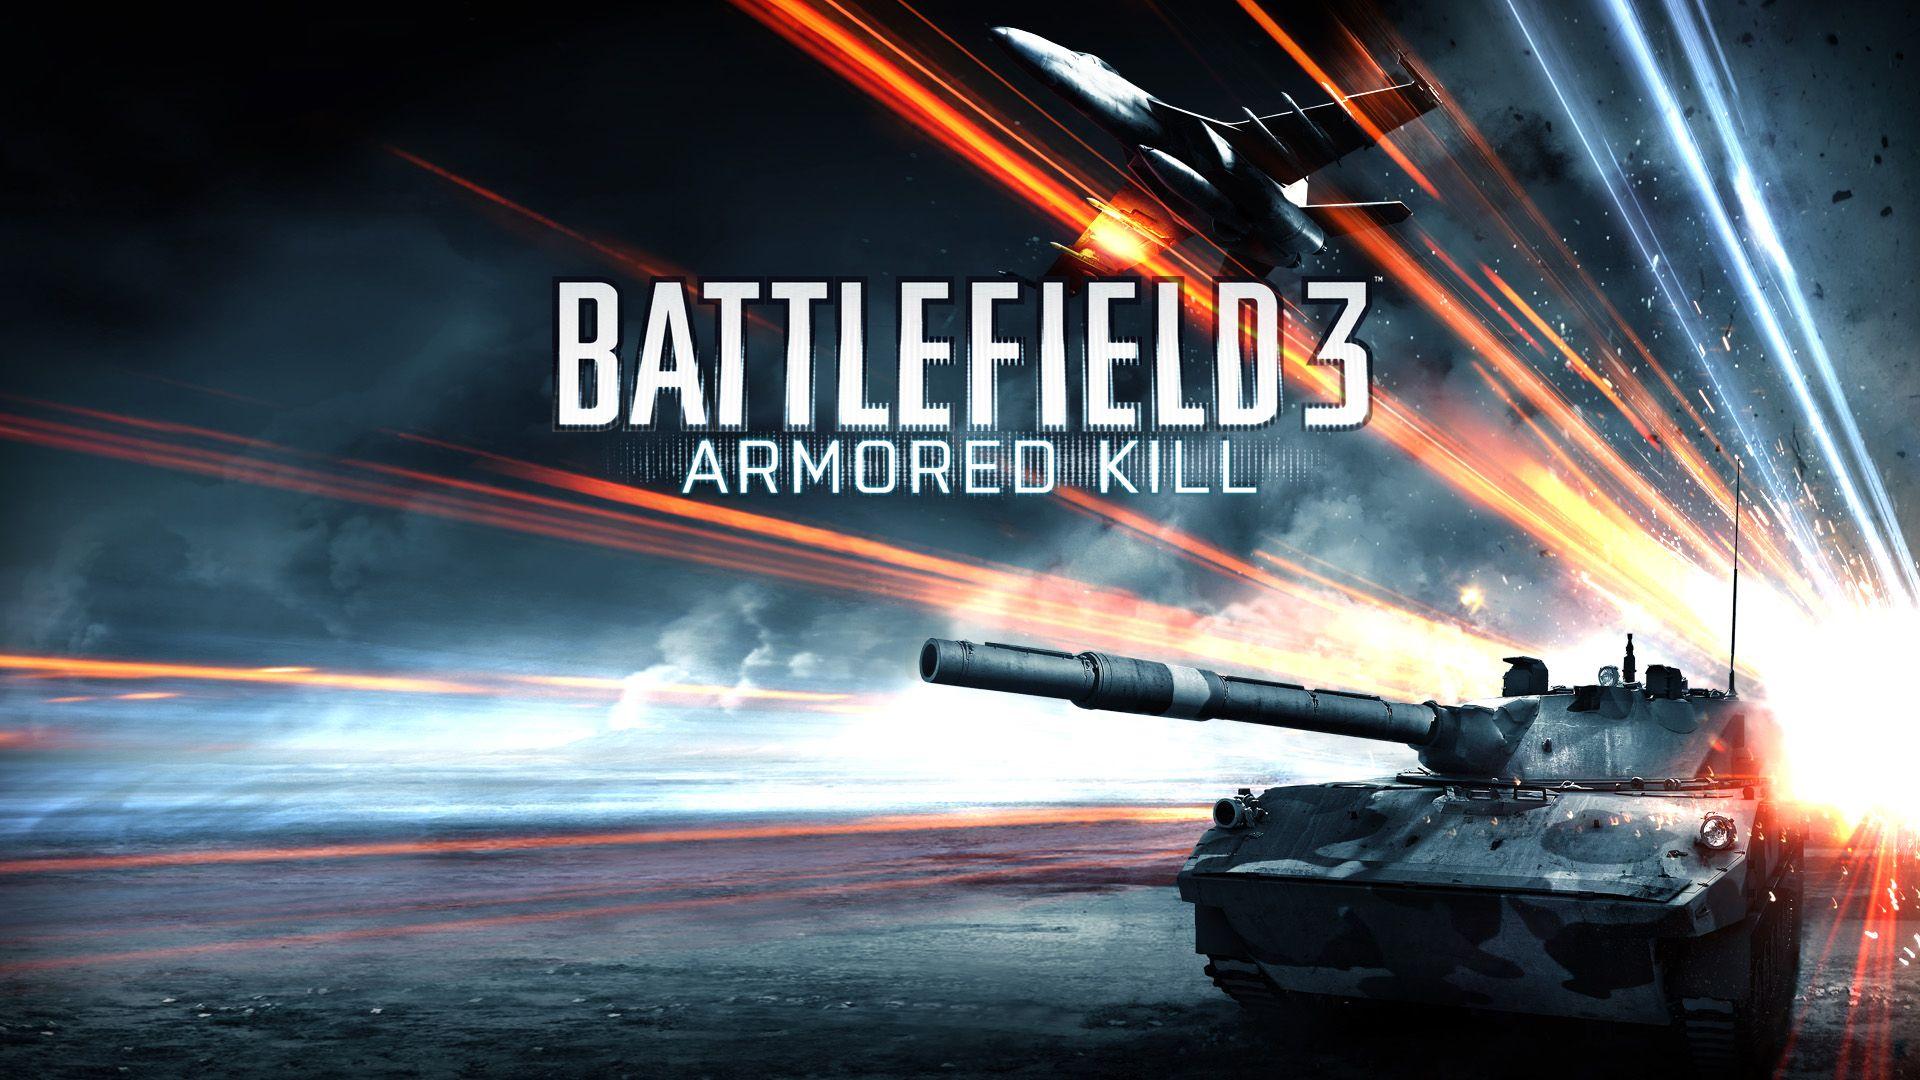 Battlefield 3 armored kill wallpaper 1920x1080 battlefield 3 battlefield 3 armored kill wallpaper 1920x1080 voltagebd Images